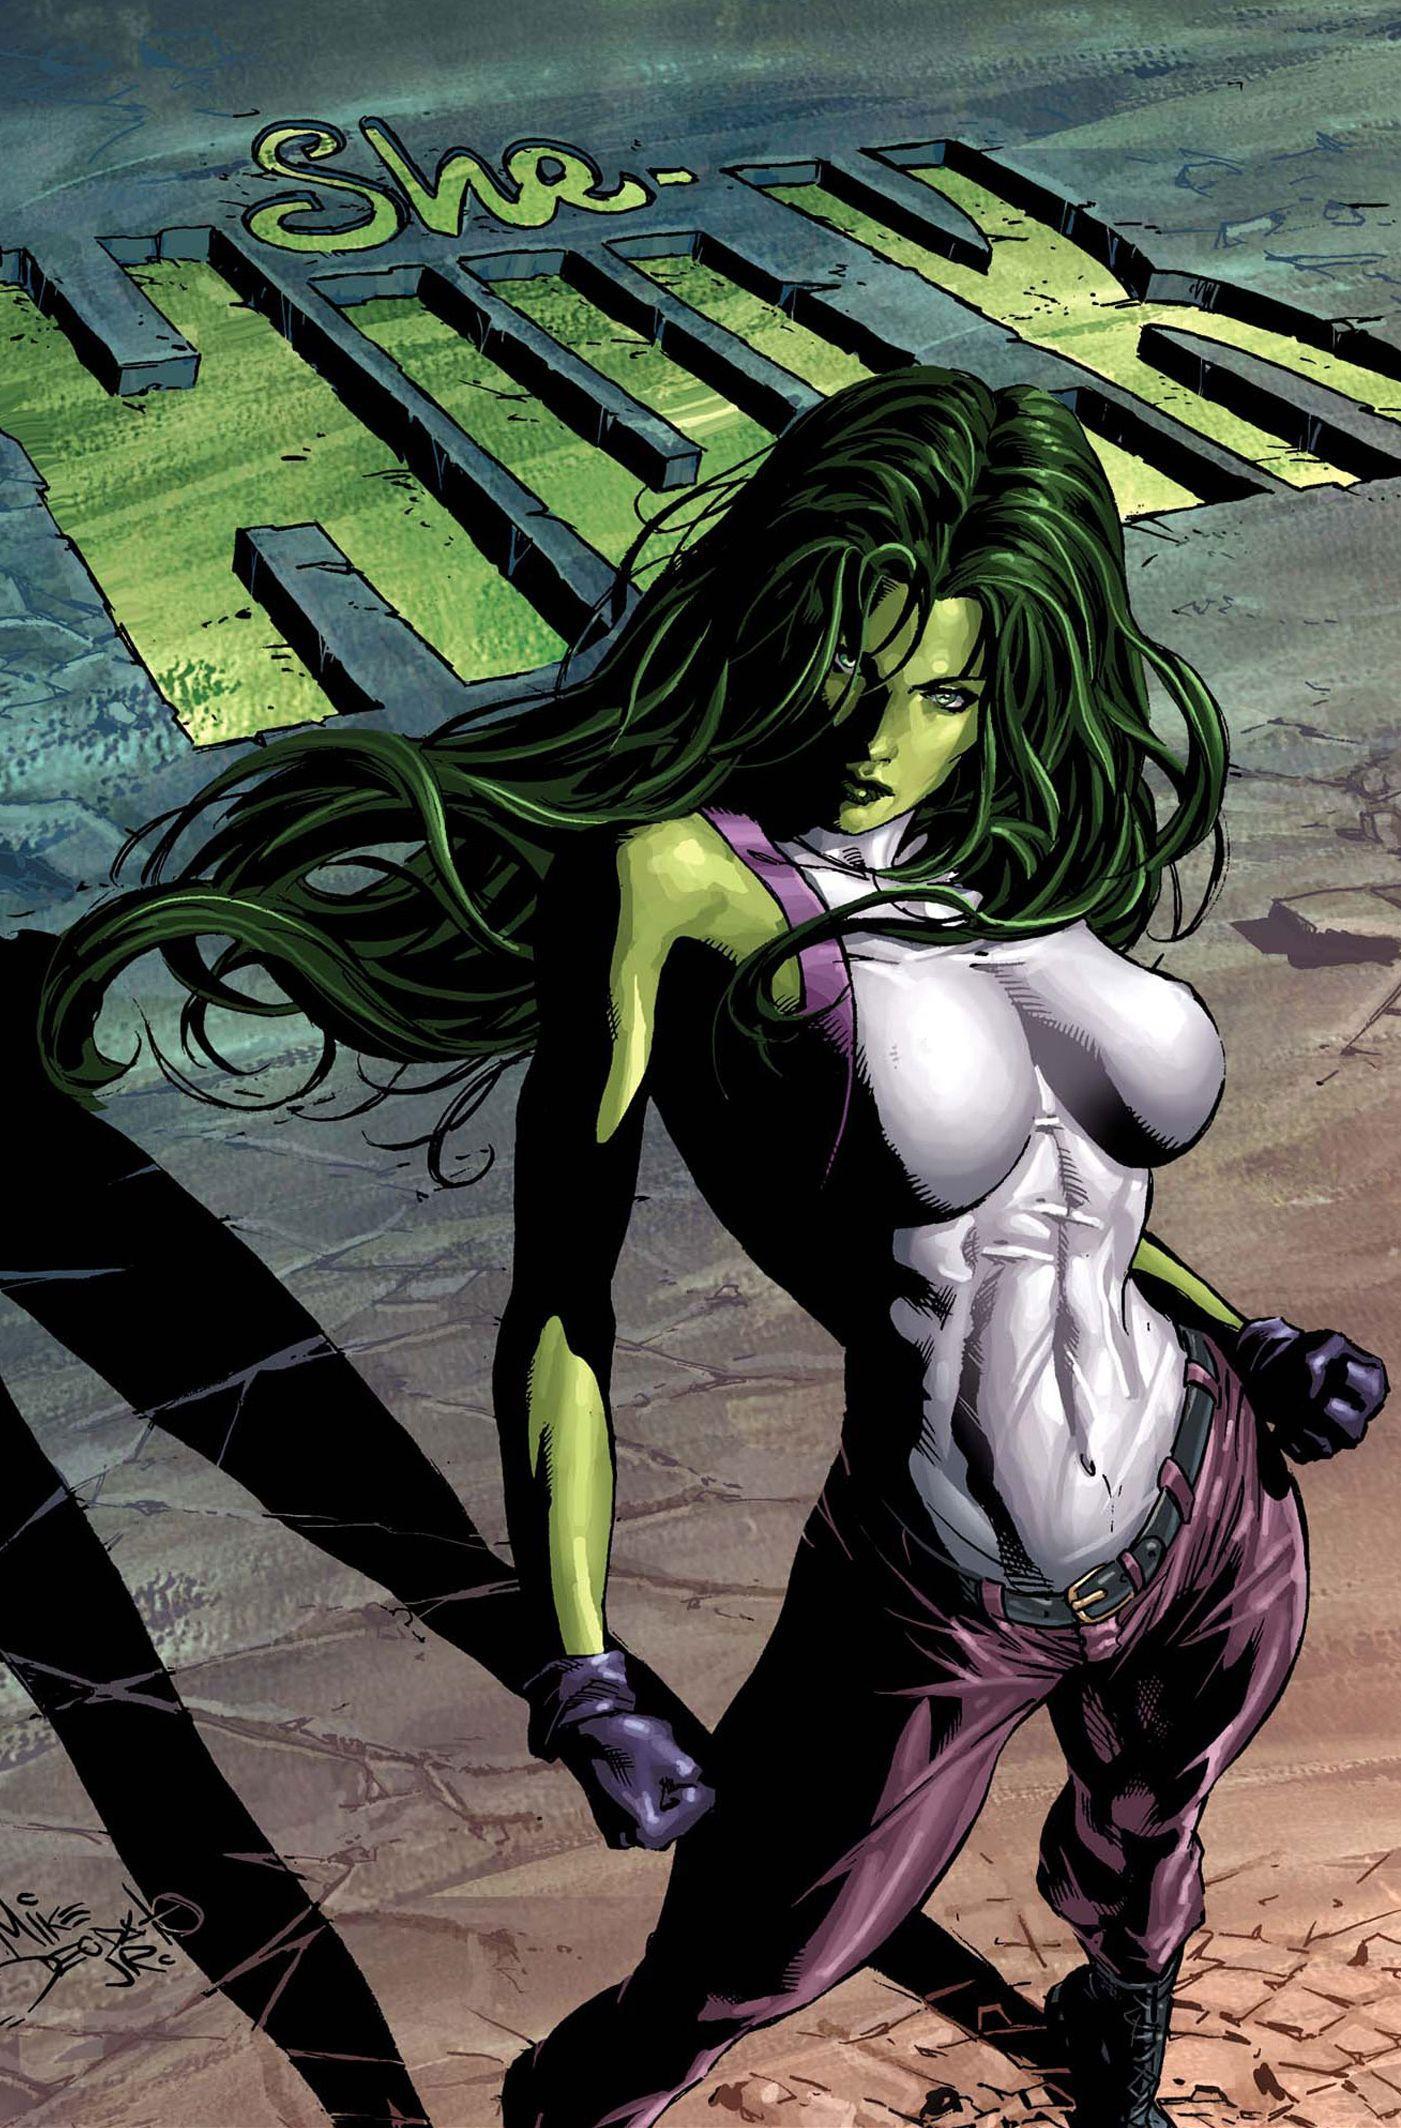 She Hulk Iray Wip By Tiangtam On Deviantart